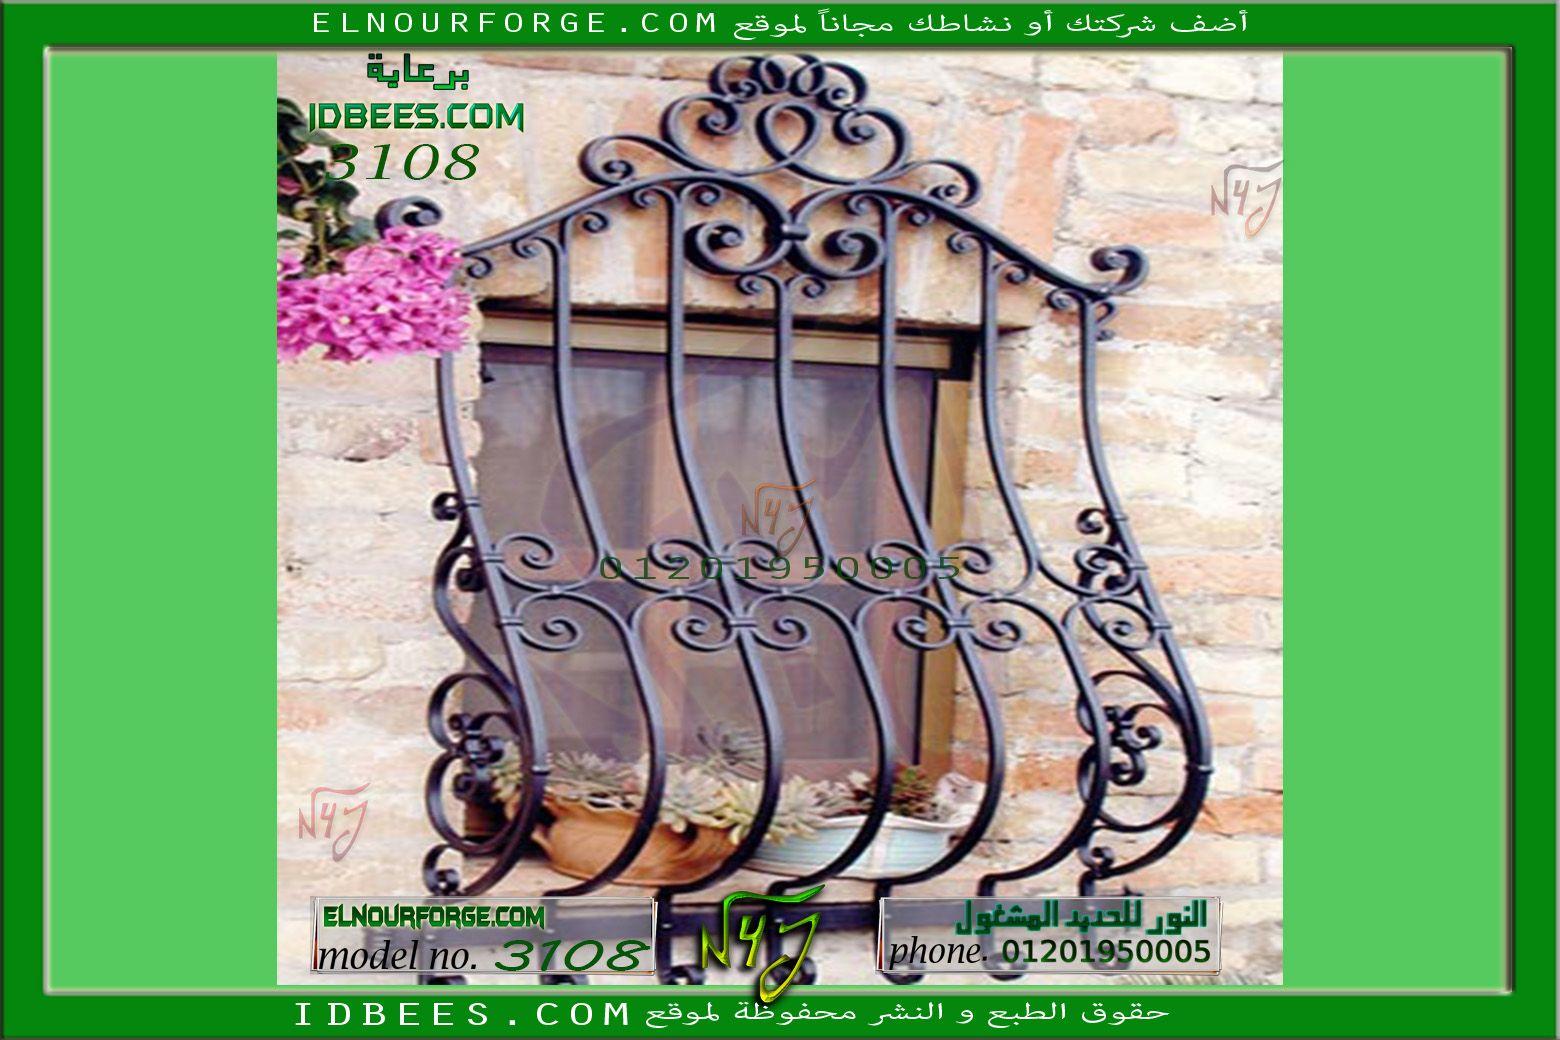 3108 Window Wrought Iron نوافذ شبابيك حديد مشغول Diy Furniture Decor Furniture